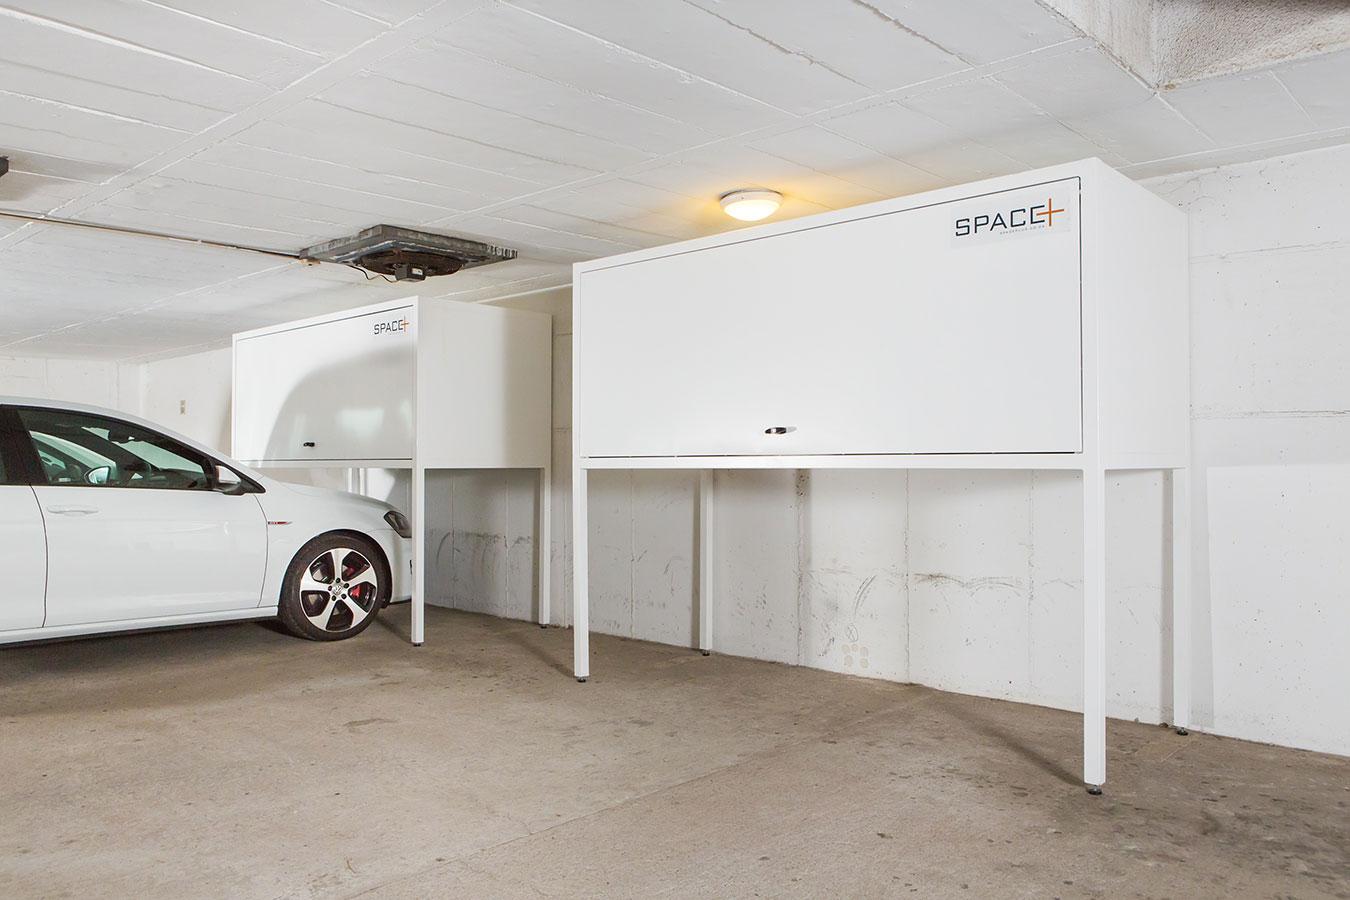 Overhead storage rack recommendations houserepairtalk for Over car garage storage